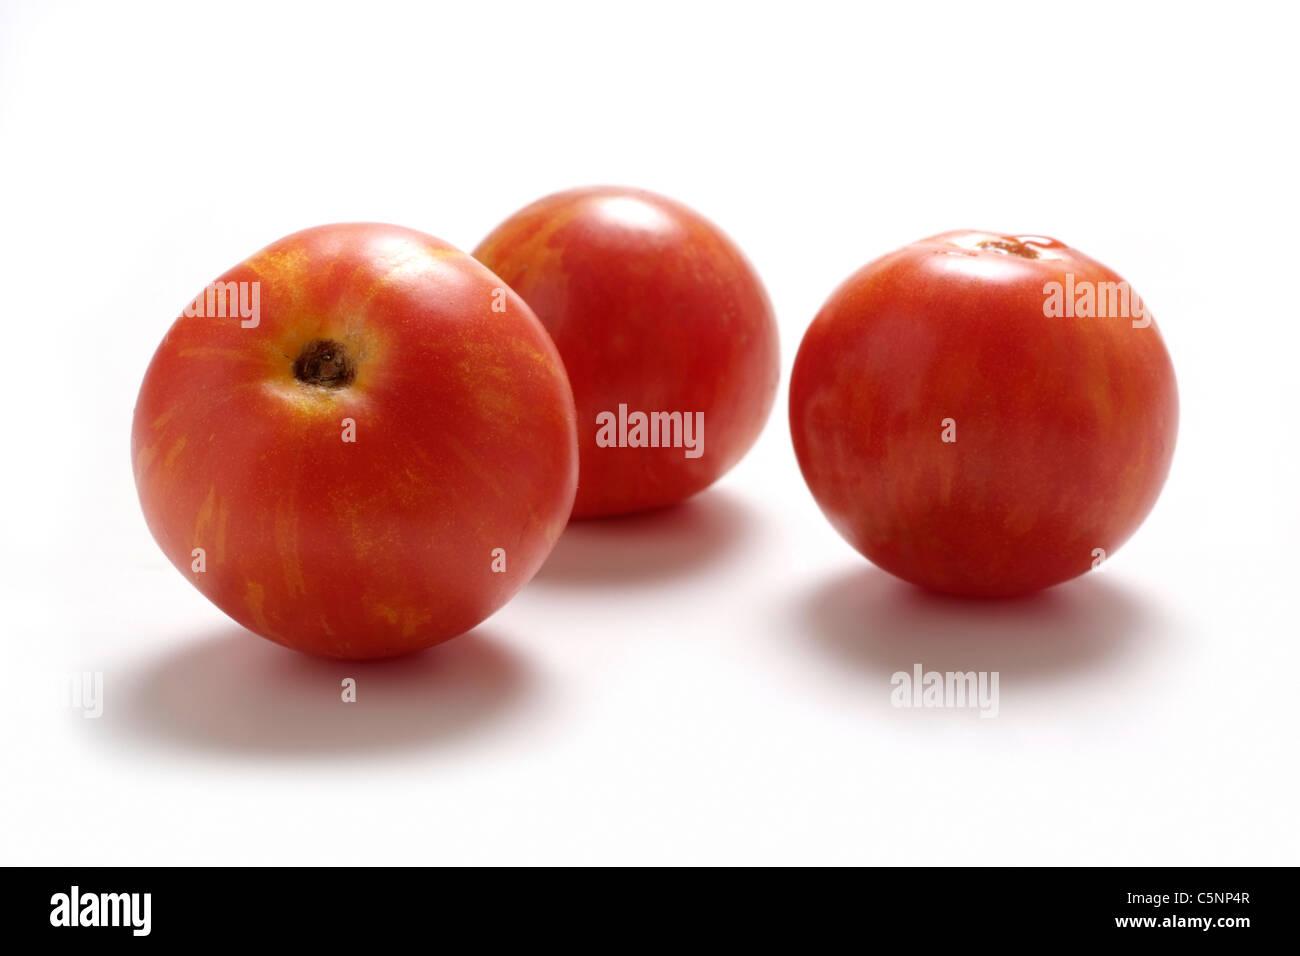 Tomato varieties: Tigerella - Stock Image